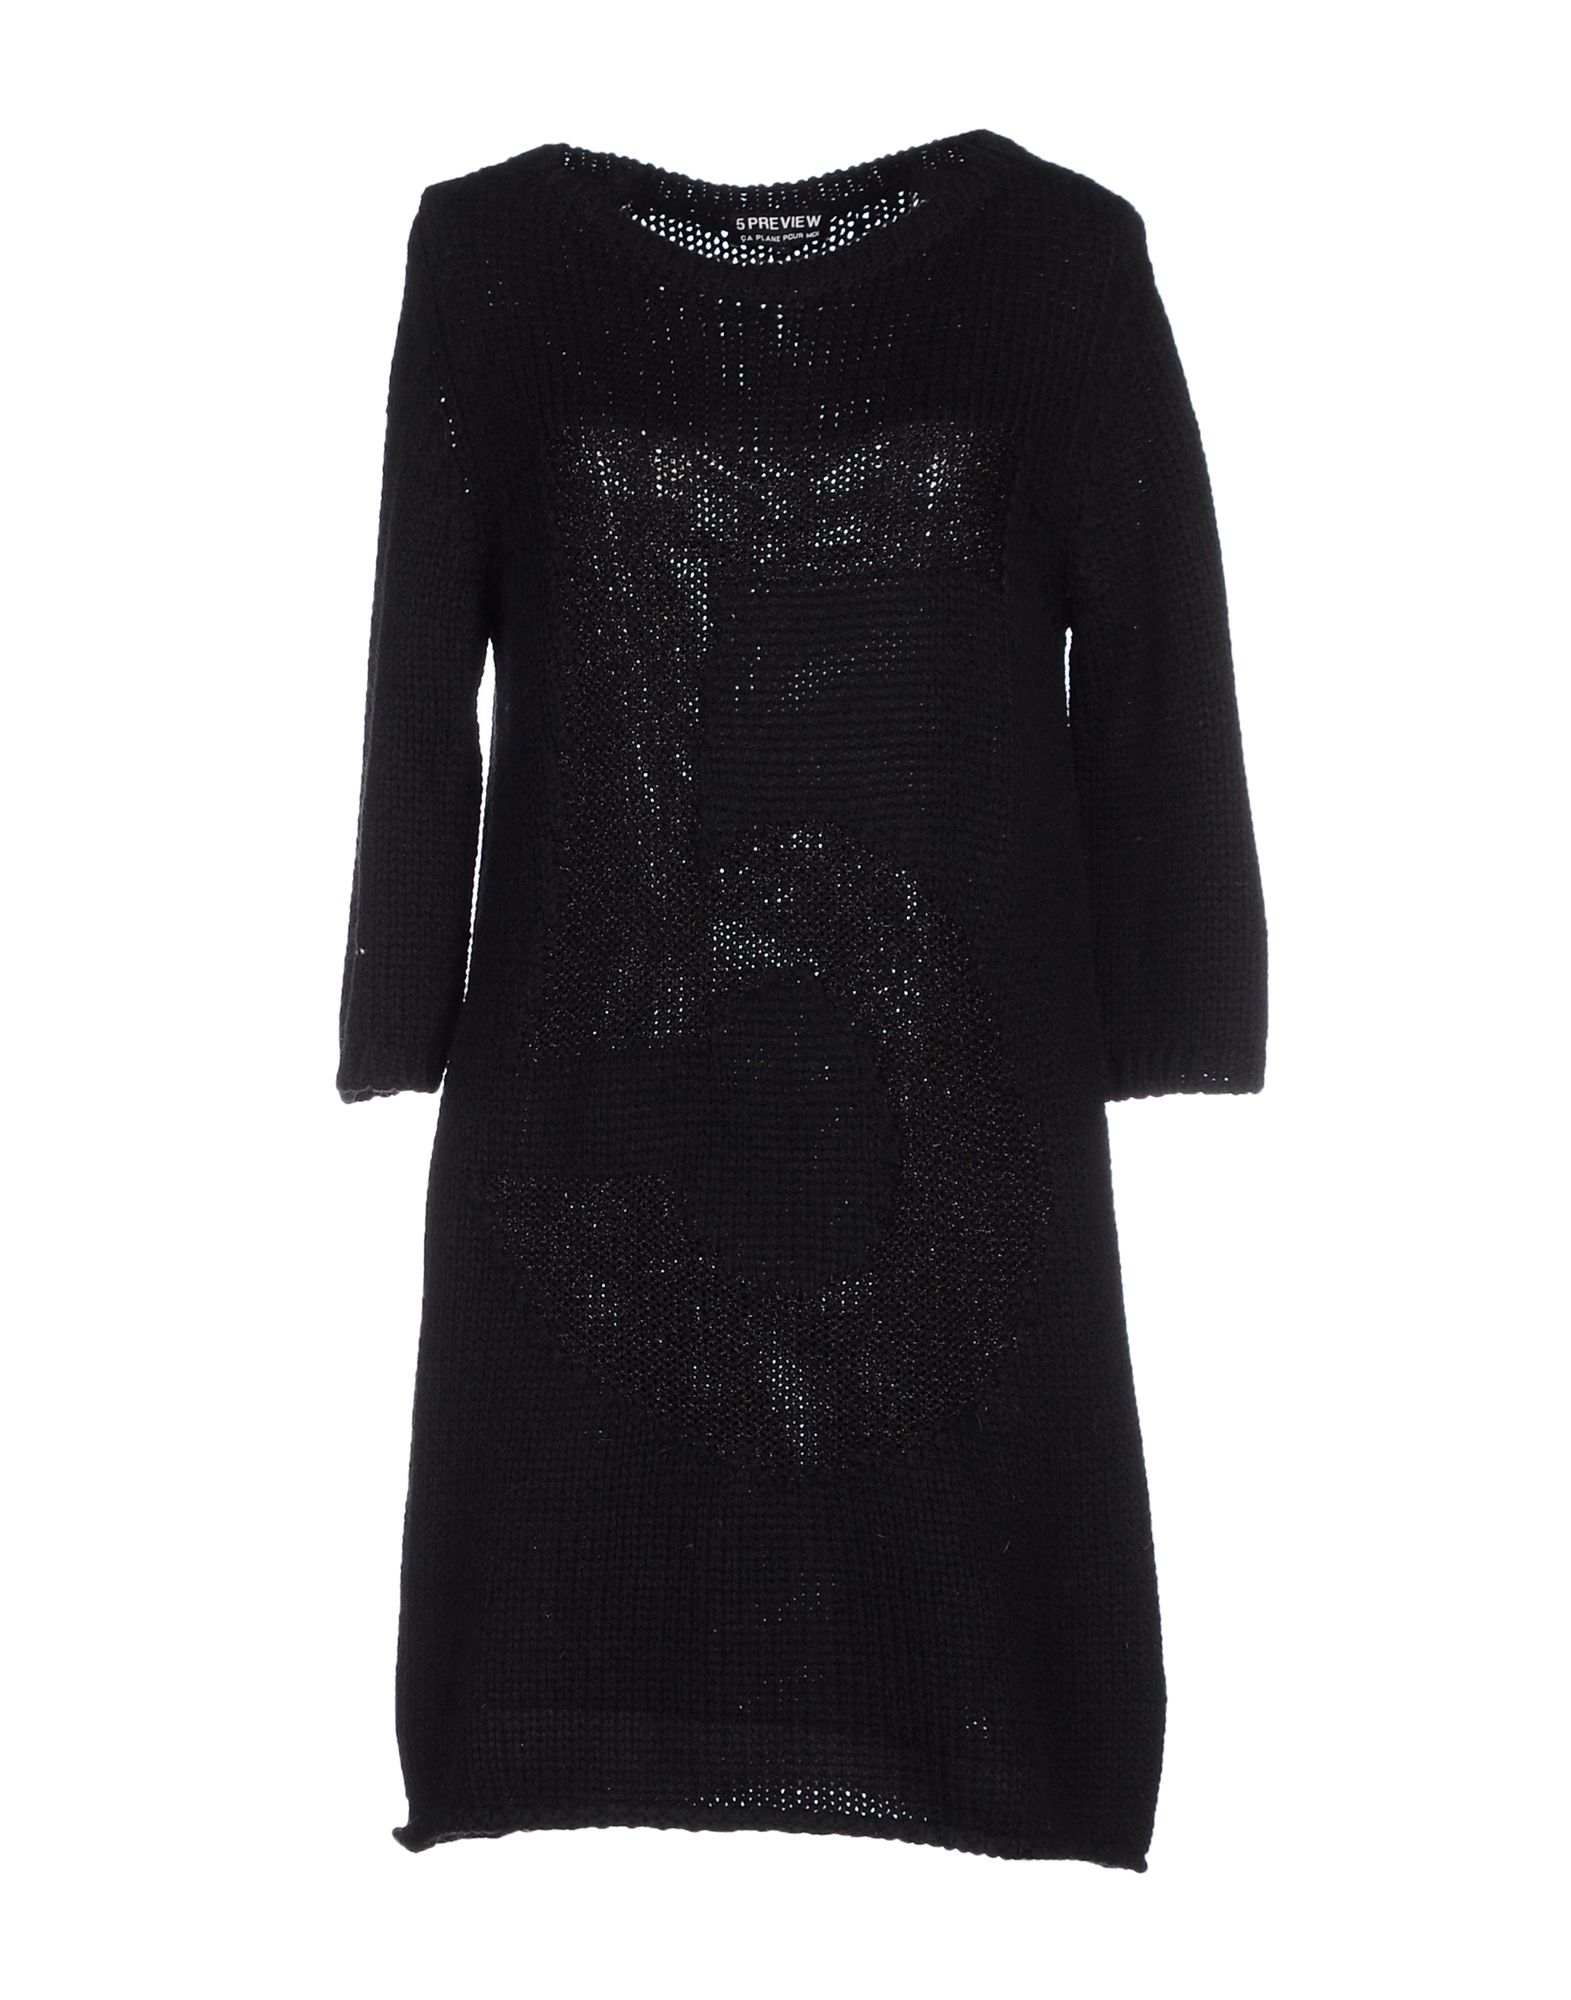 5PREVIEW Короткое платье вязаное платье